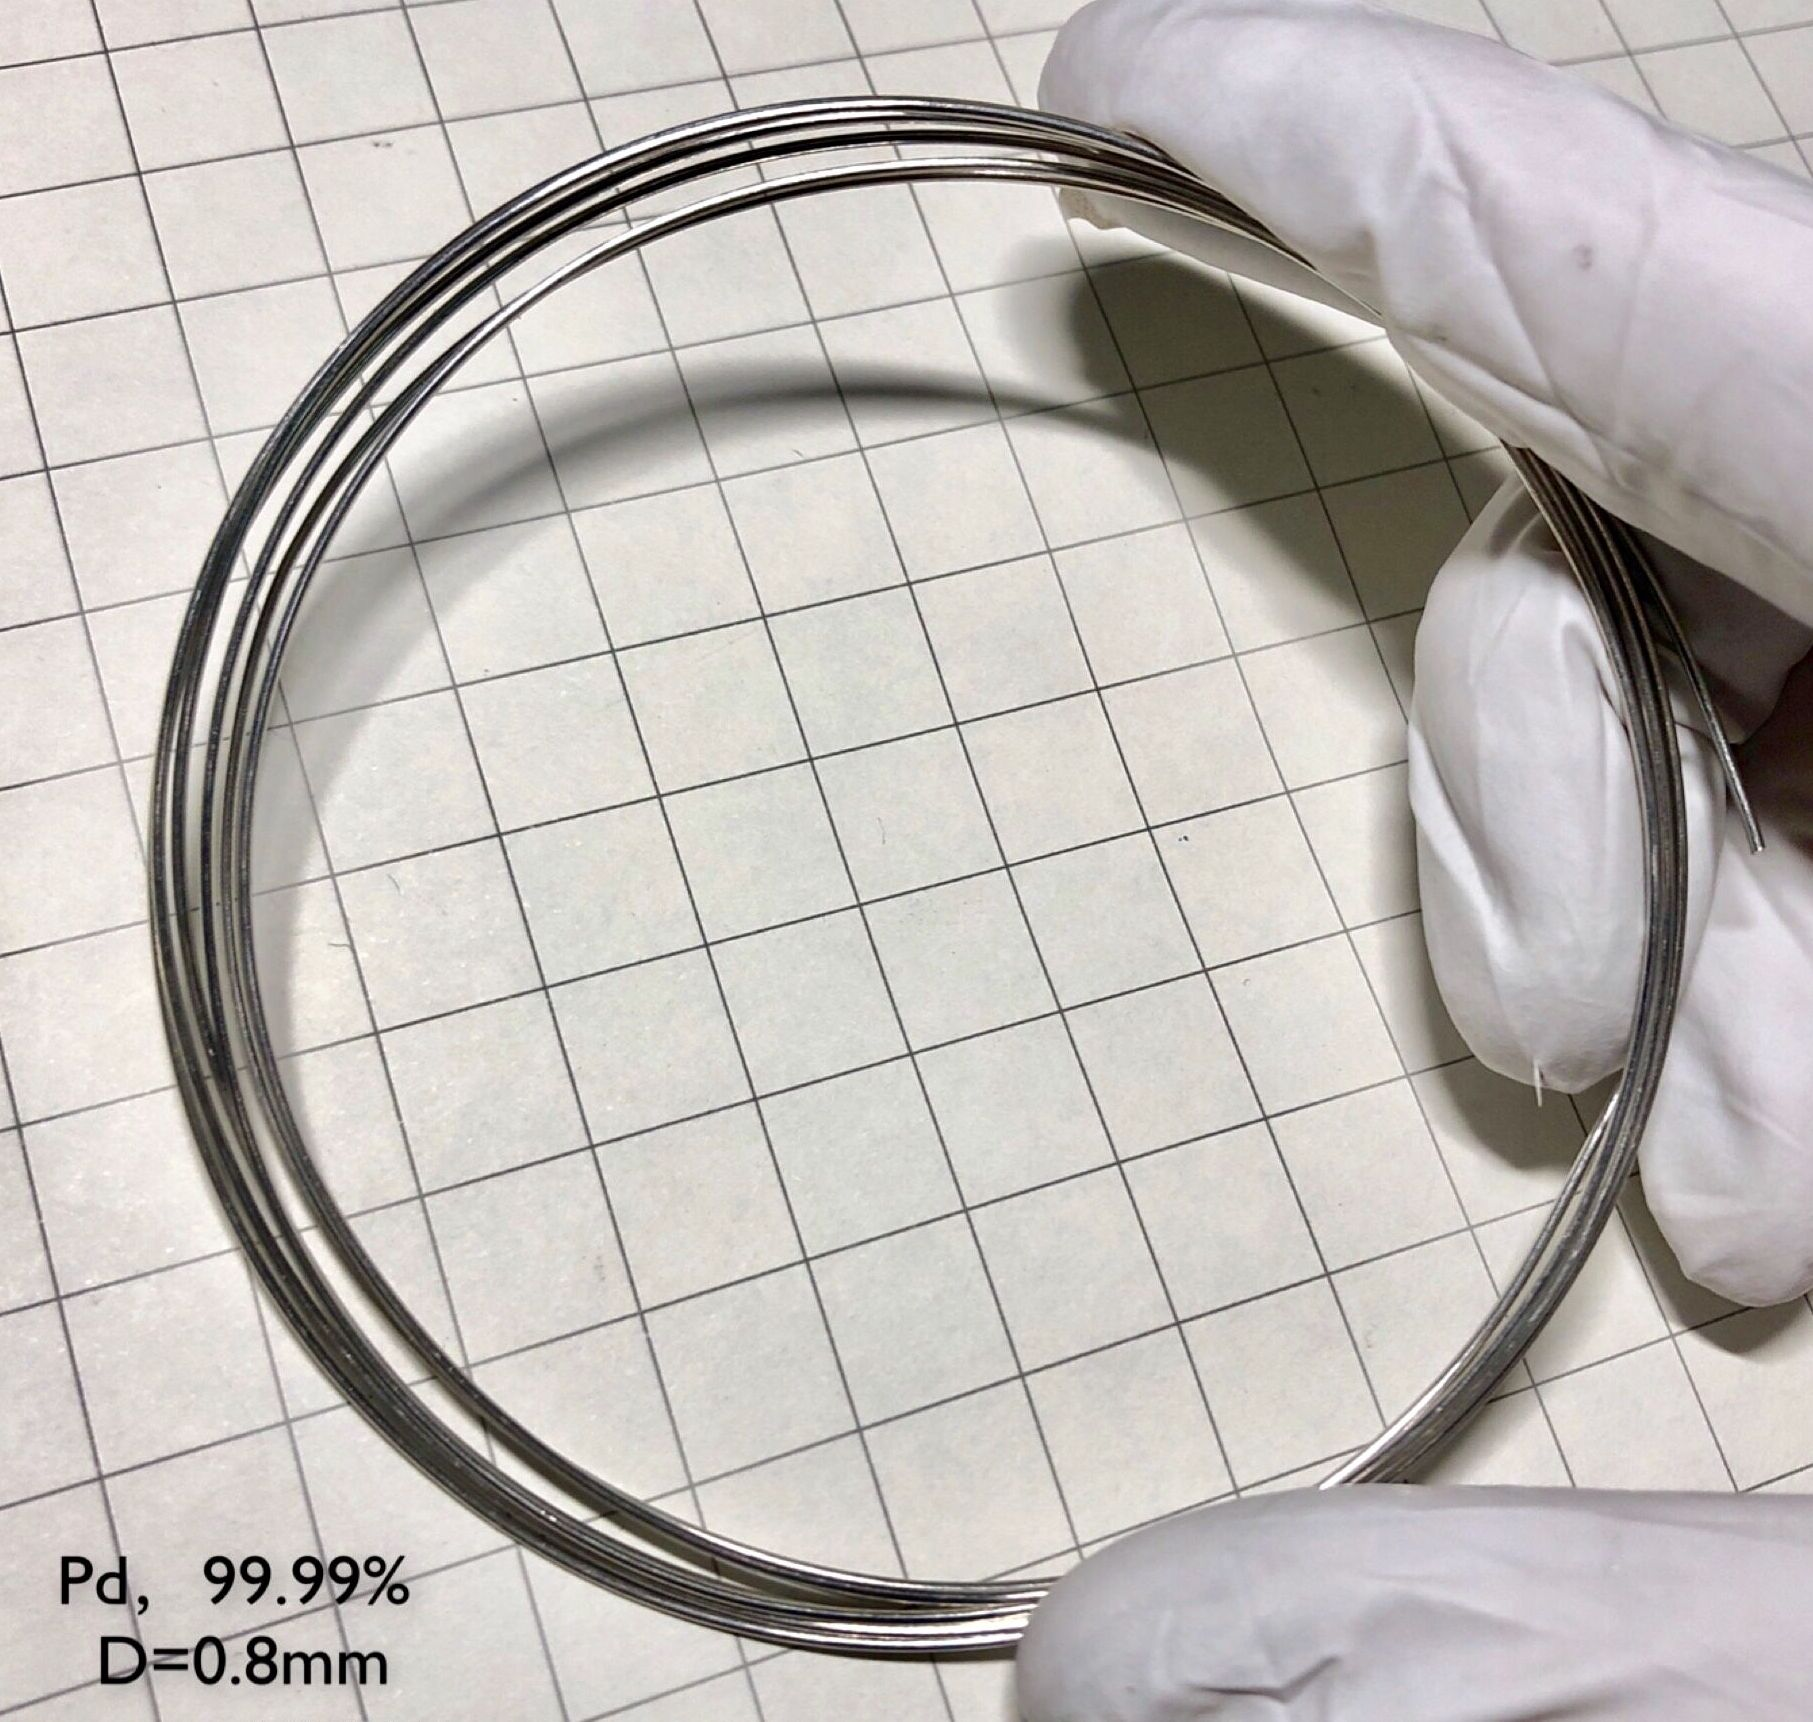 Alambre de metal de paladio 99.99% elemento Pd diámetro puro 0,8mm